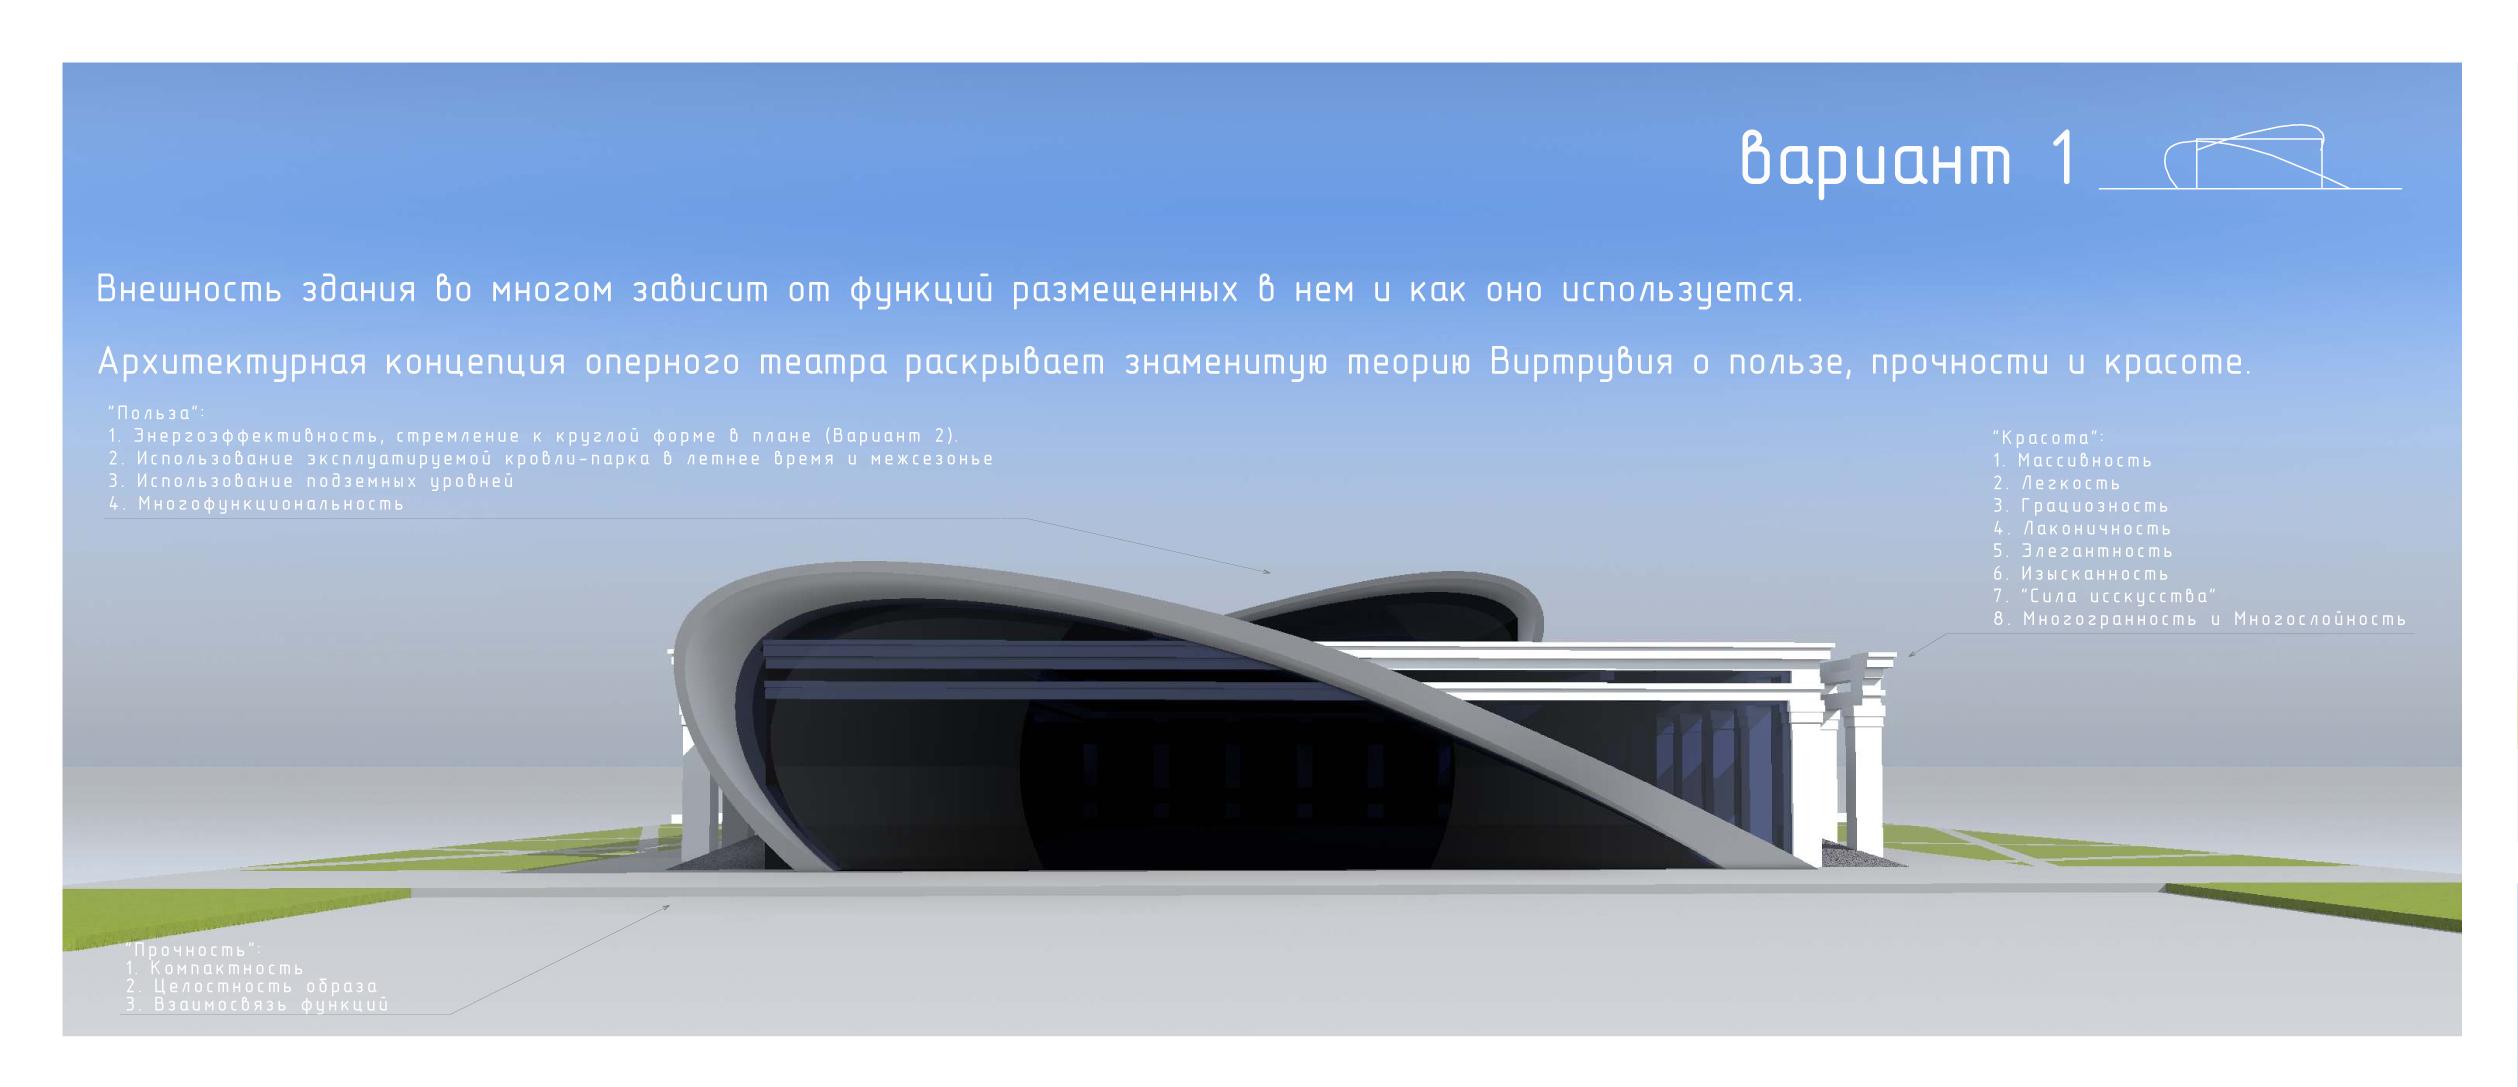 Разработка архитектурной концепции театра оперы и балета фото f_50352ede6edc440a.jpg